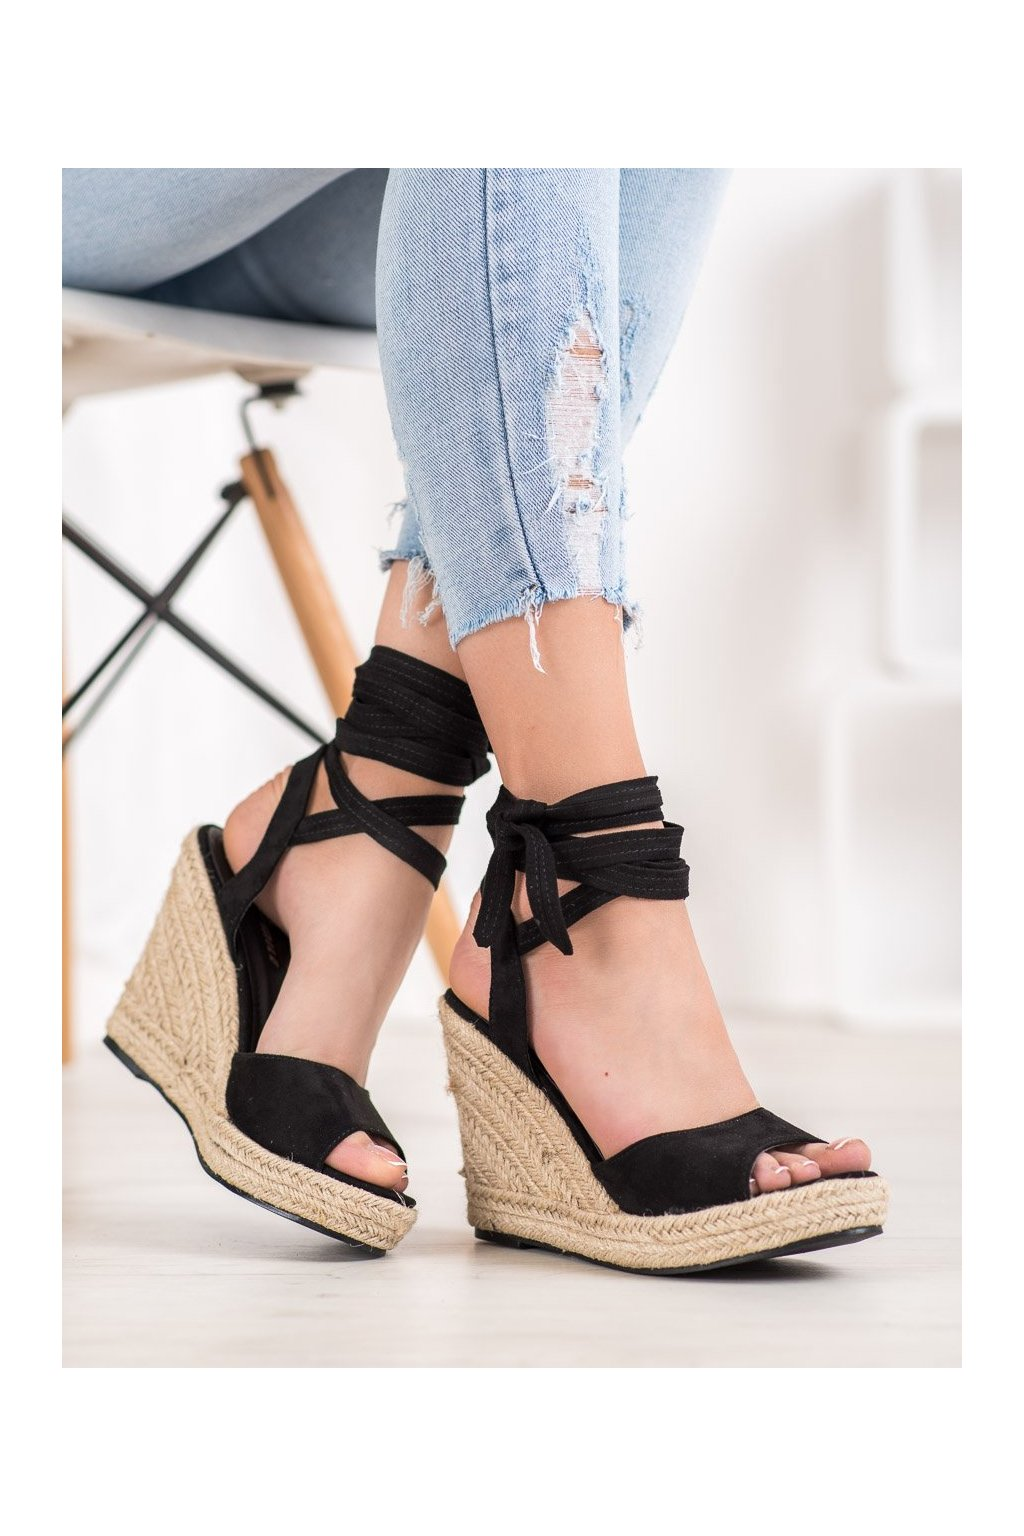 Čierne sandále Yes mile kod YES-3123B